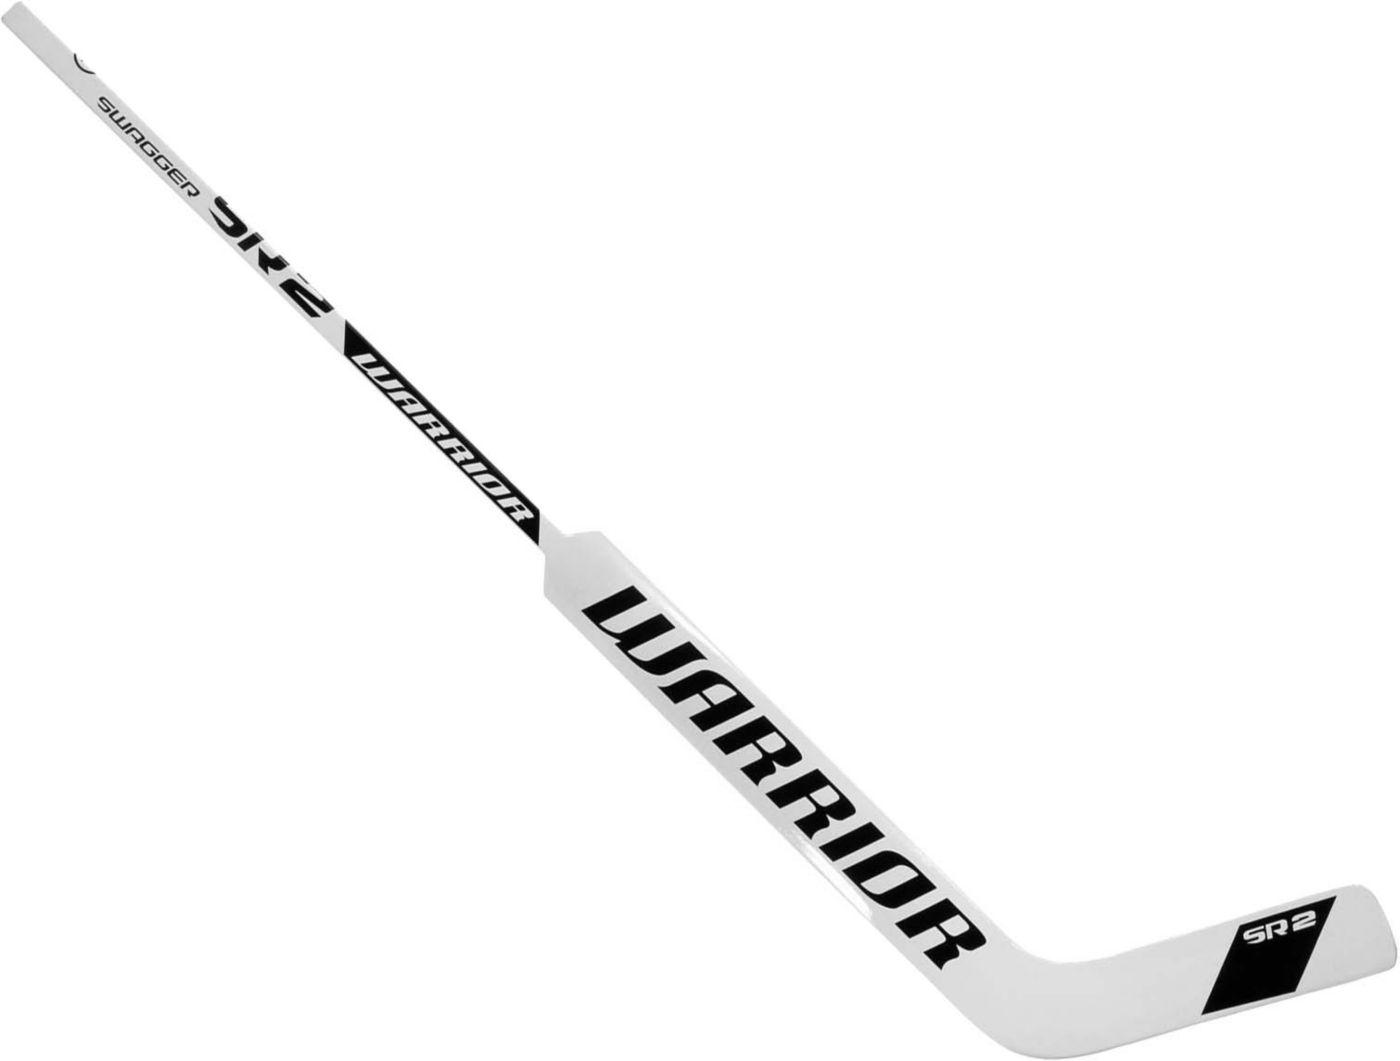 Warrior Junior Swagger SR2 Hockey Goalie Stick